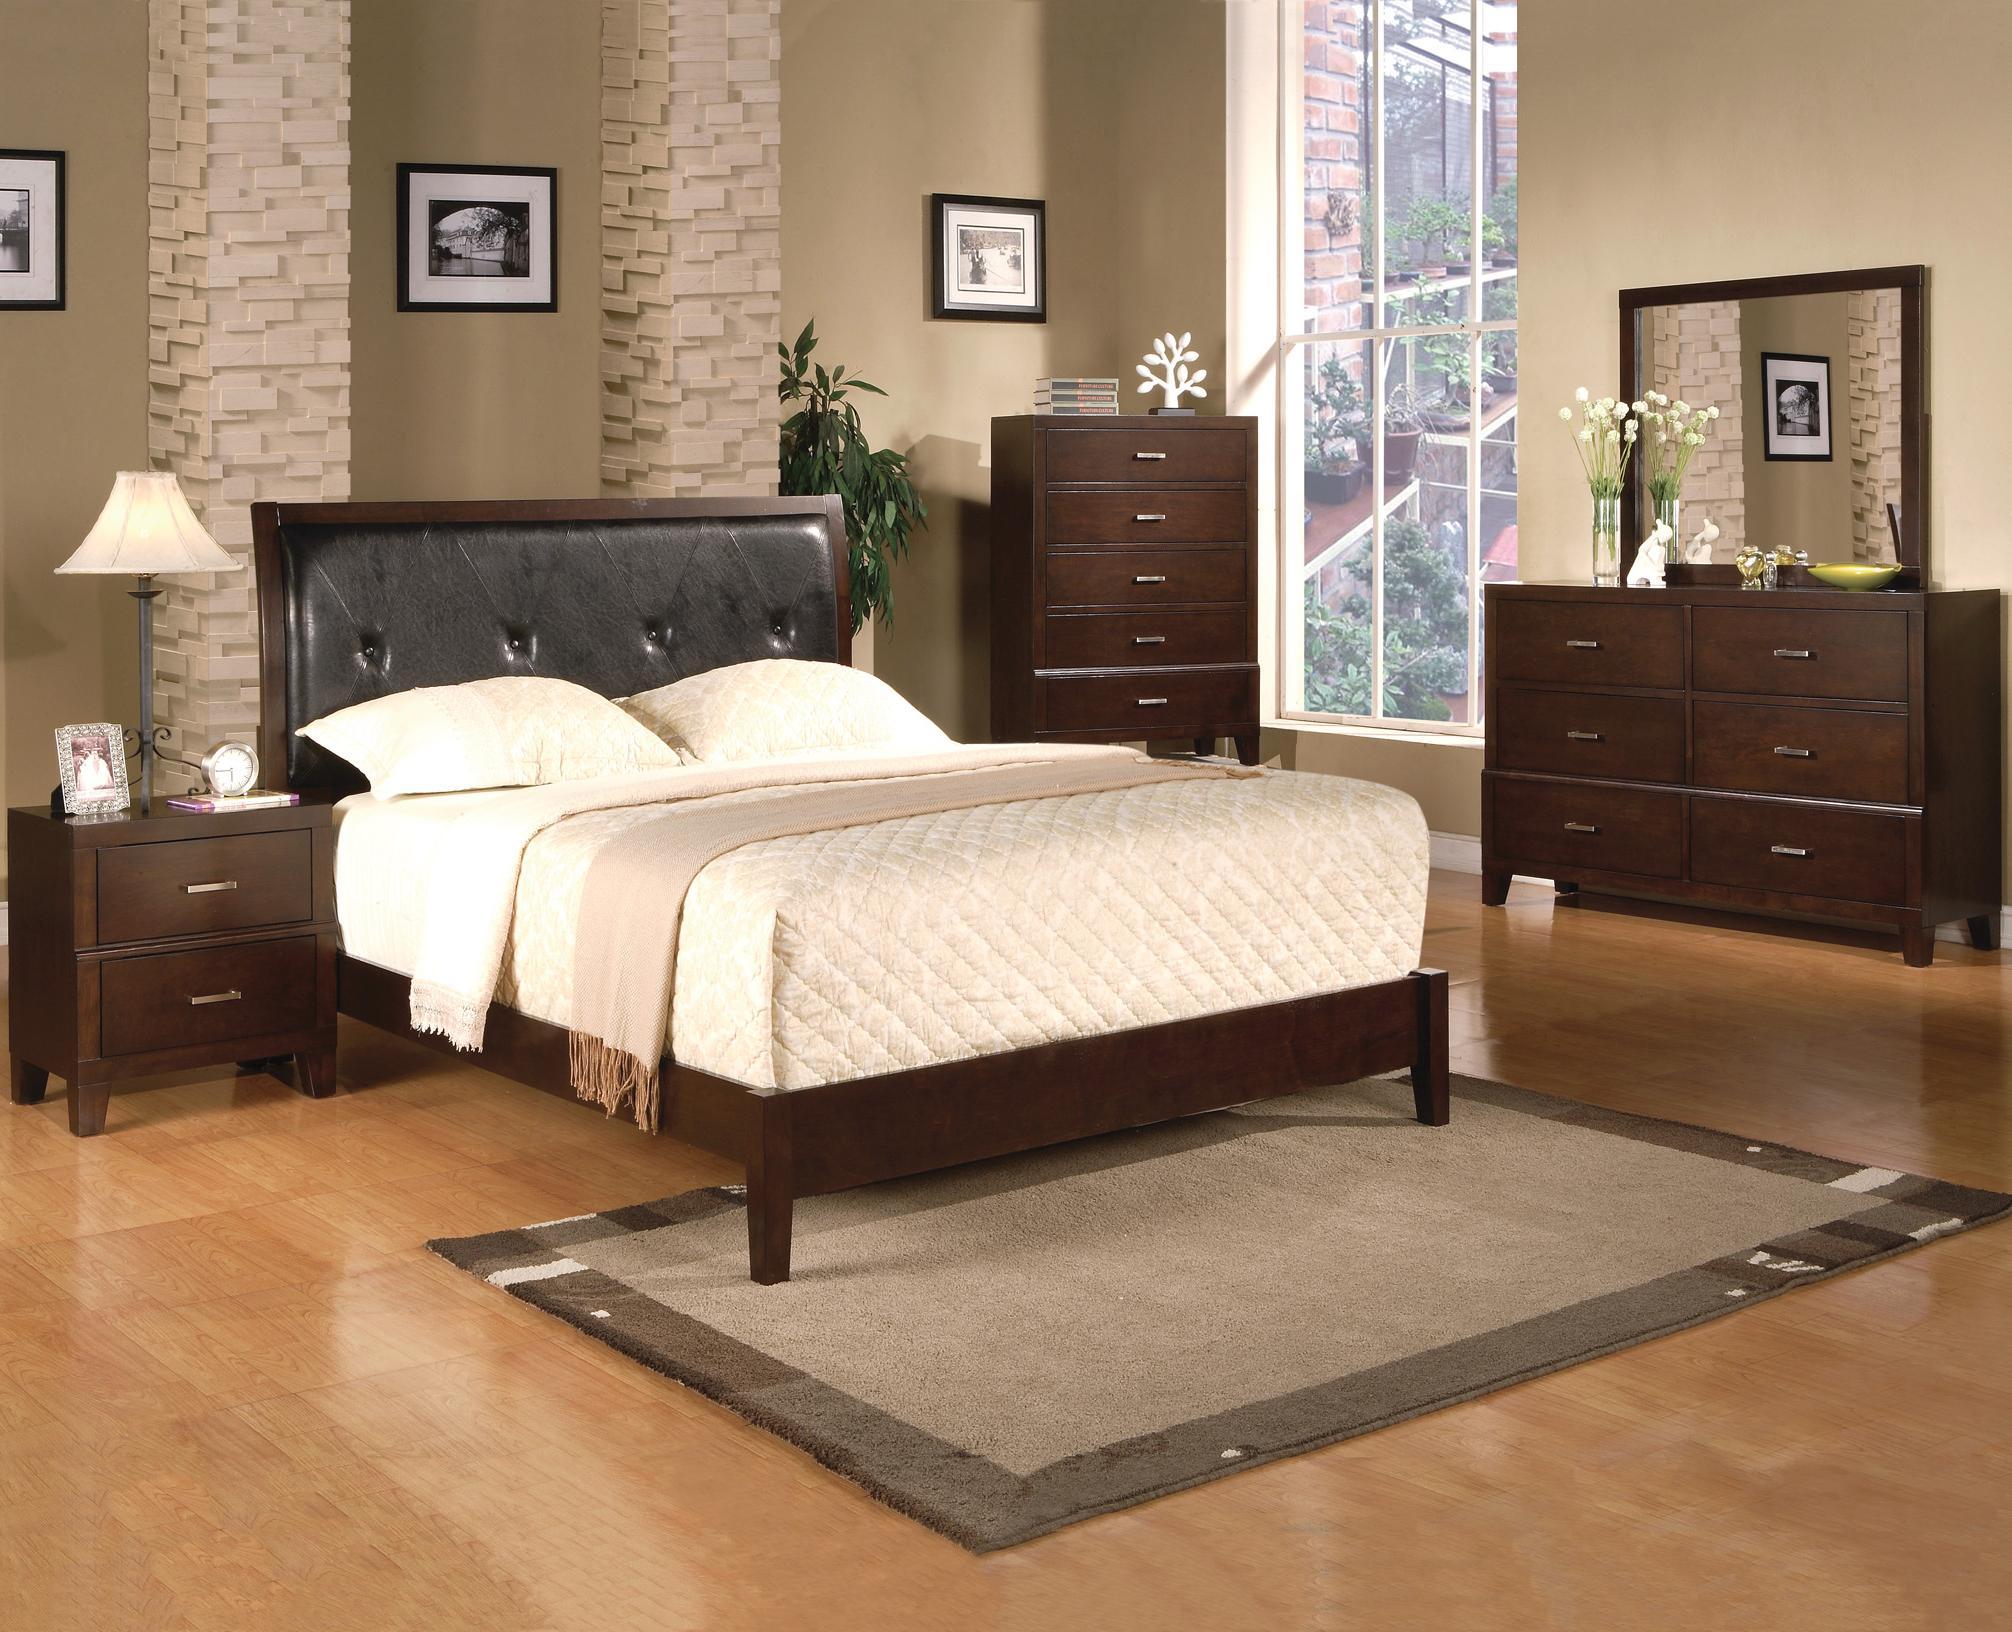 Crown Mark Serena King Bedroom Group - Item Number: B8150 King Bedroom Group 2